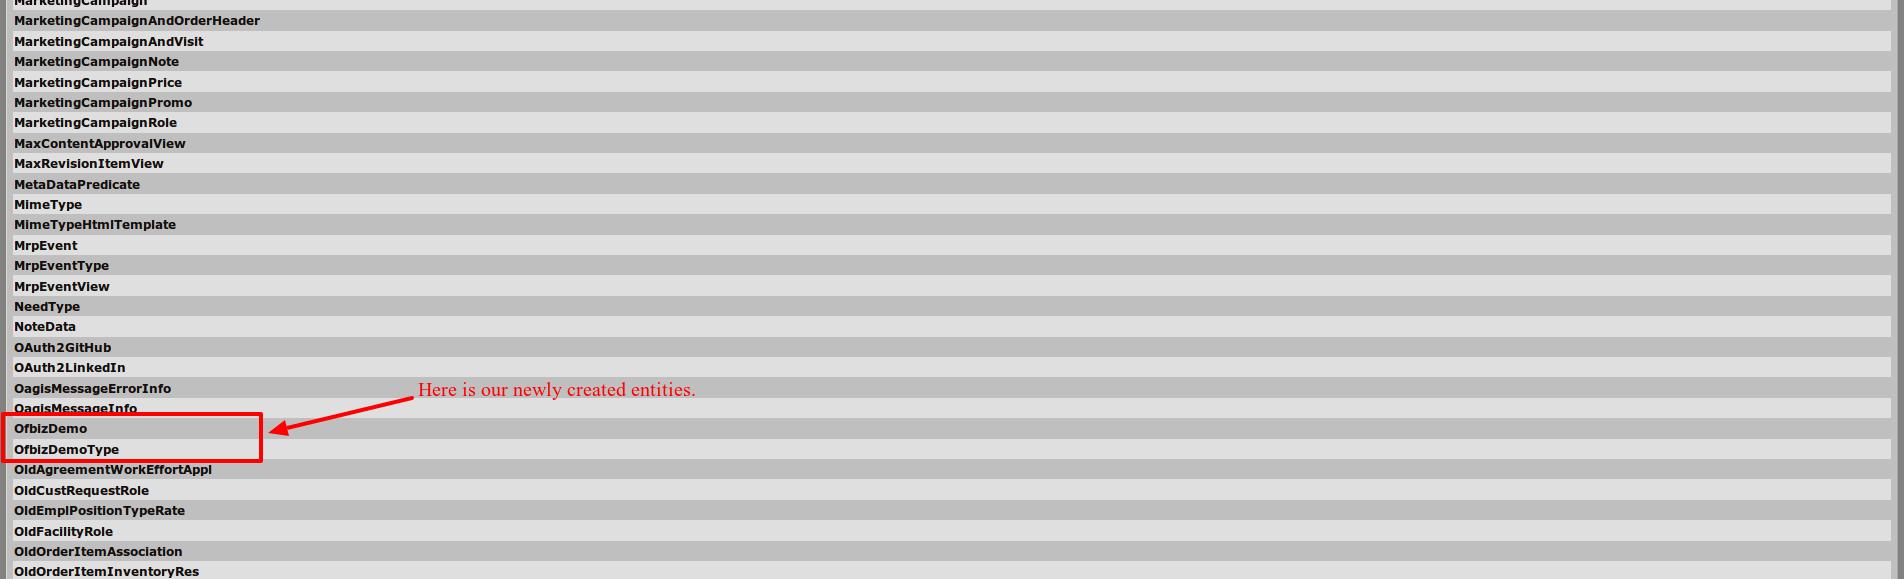 OFBiz Tutorial - A Beginners Development Guide for 16 11